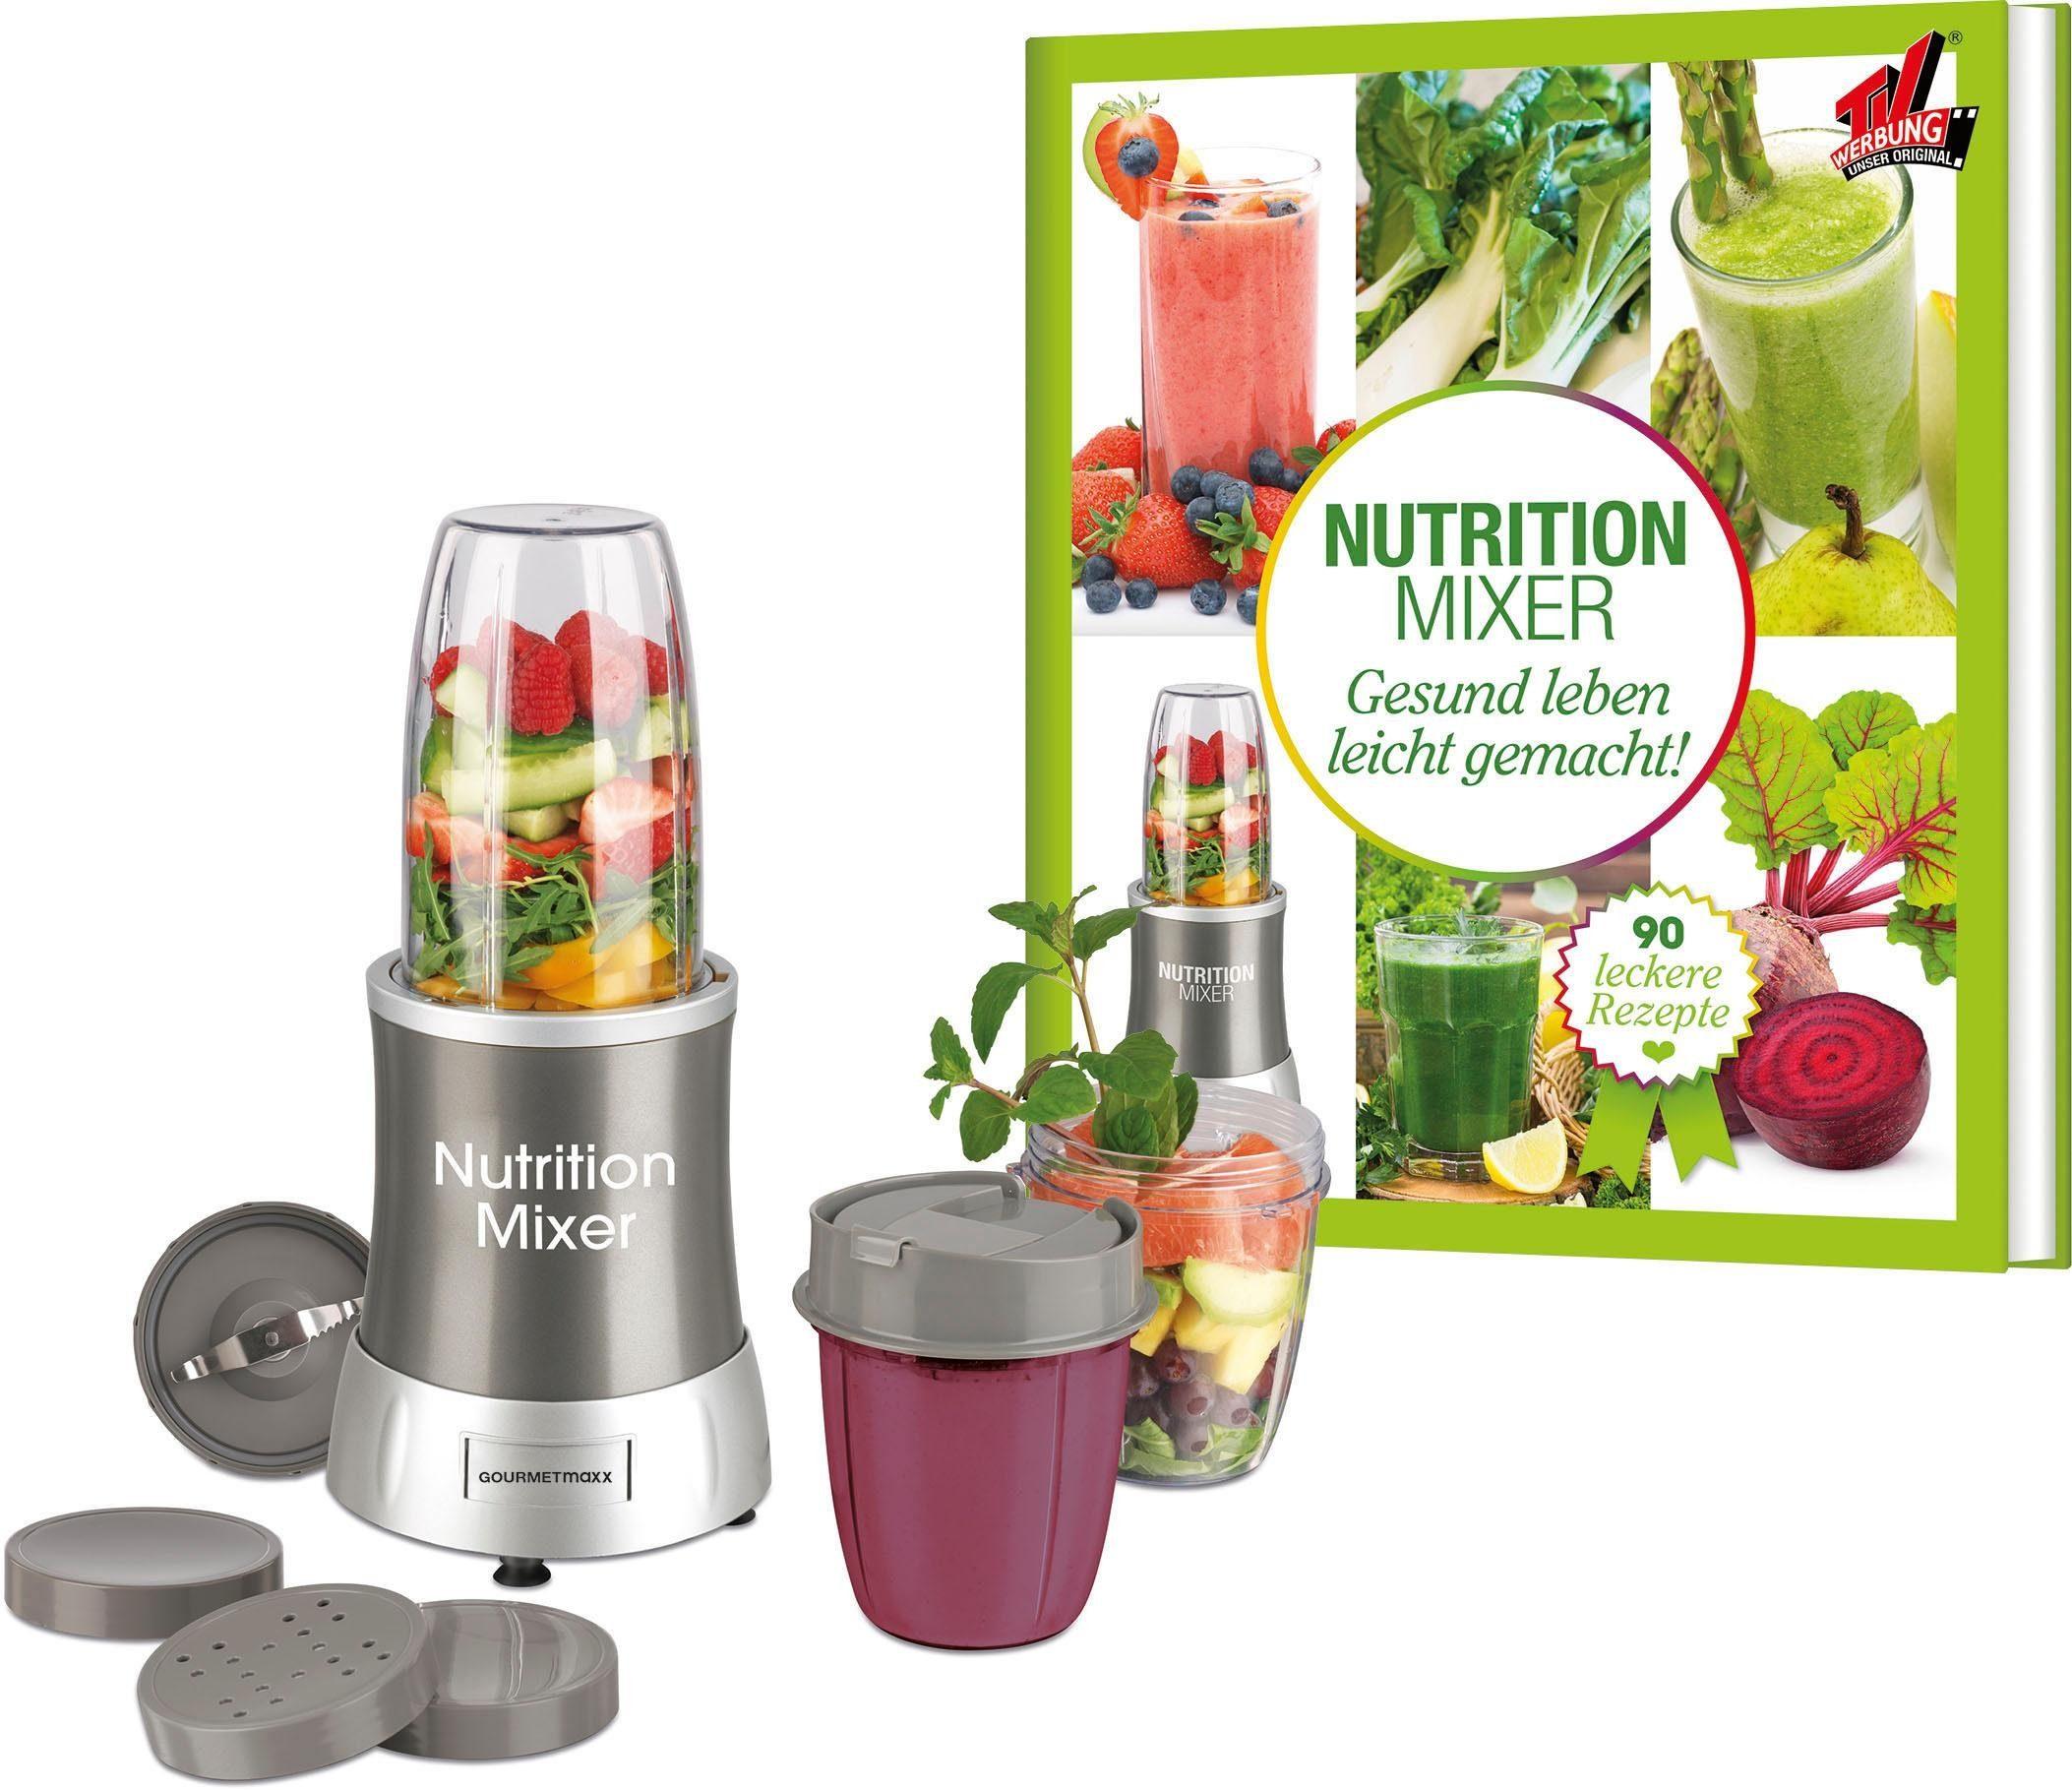 GOURMETmaxx Smoothie-Maker Nutrition, 700 W